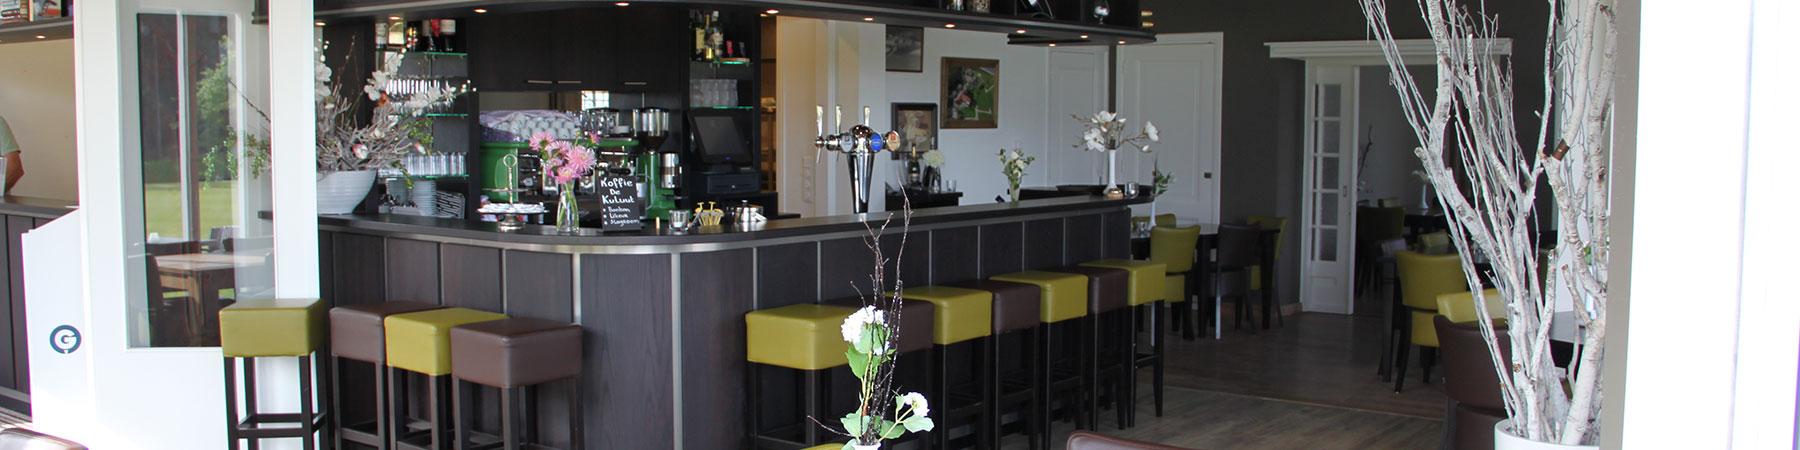 brasserie-de-kuluut-overloon1